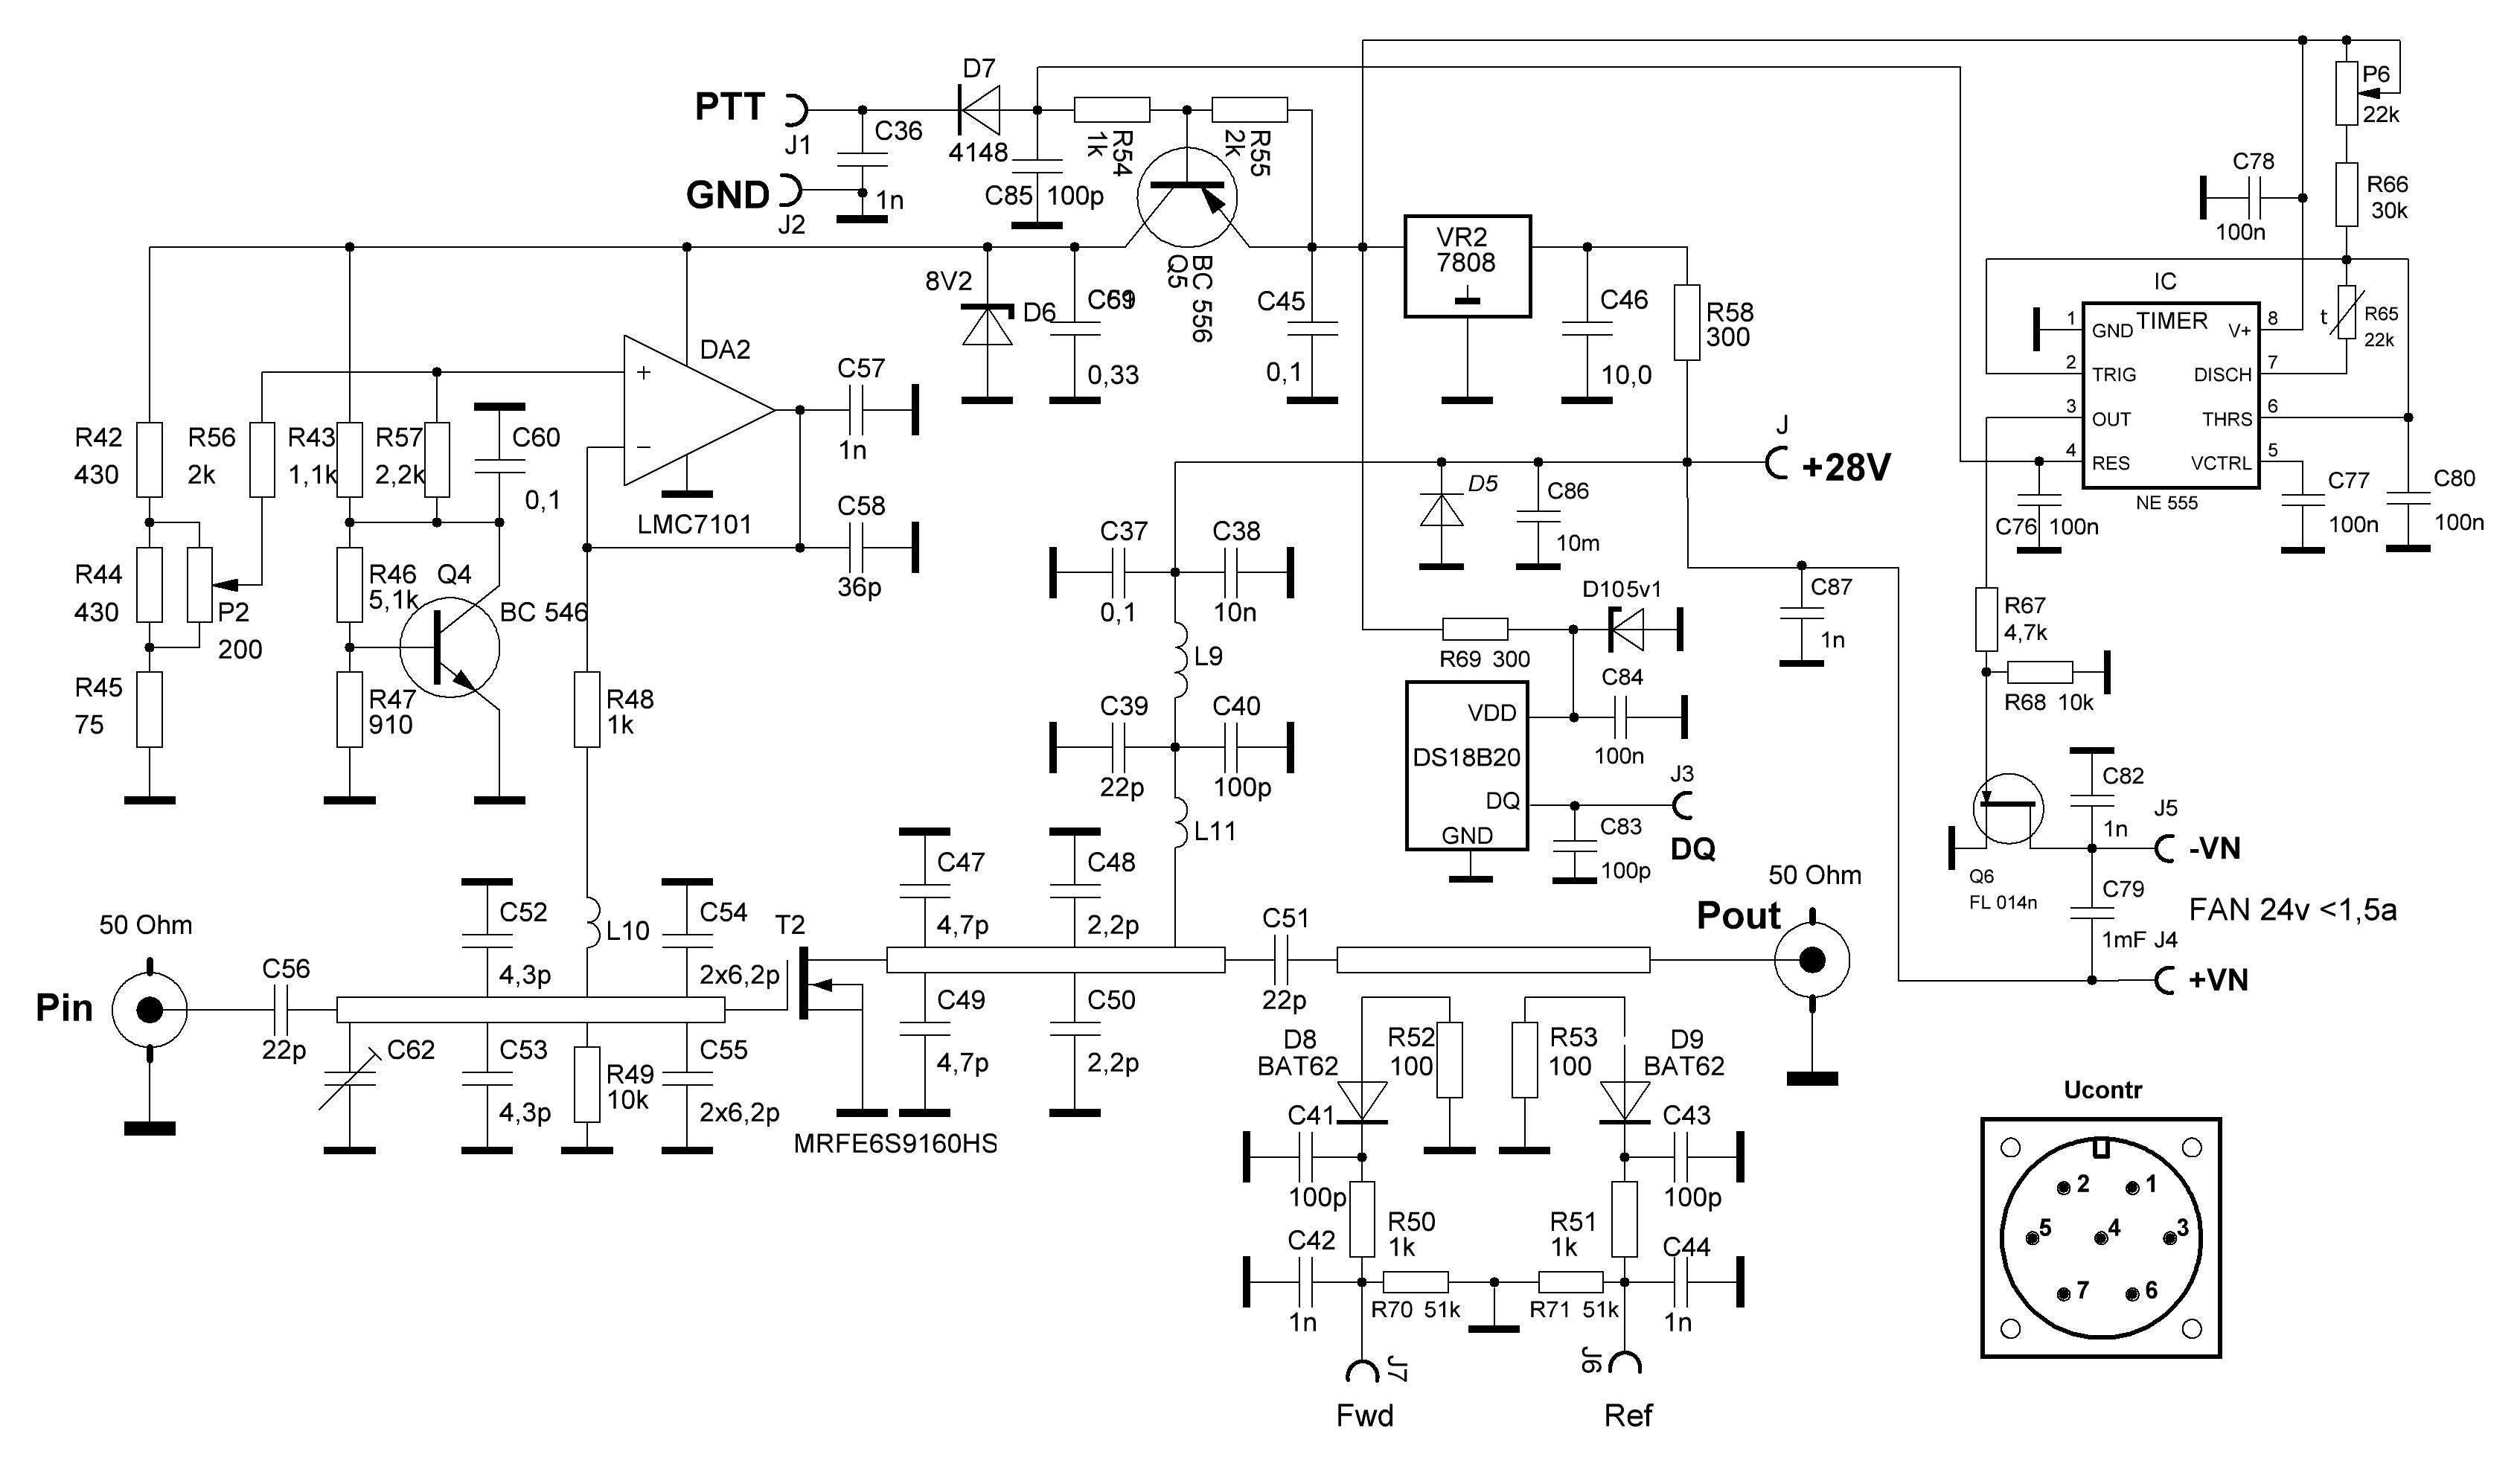 Принципиальная схема PA 23cm 150W